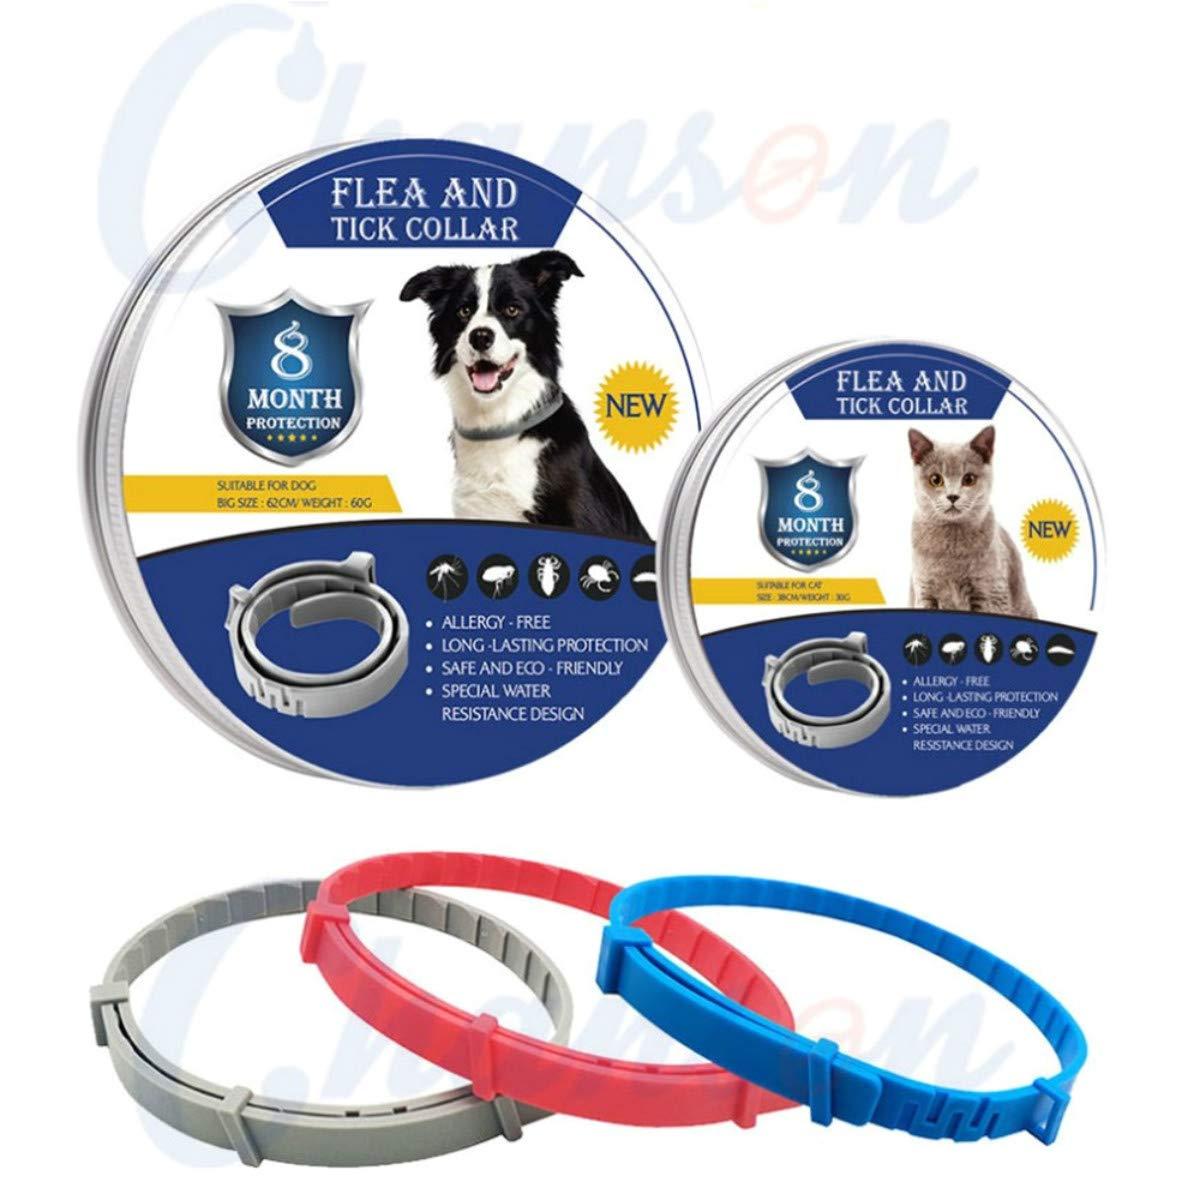 Find Li Collar Repelente De Insectos para Mascotas Suministros De Desparasitaci/óN para Mascotas Gato Collar para Perros Pulgas Repelente De Mosquitos Eliminador De Insectos 38cm